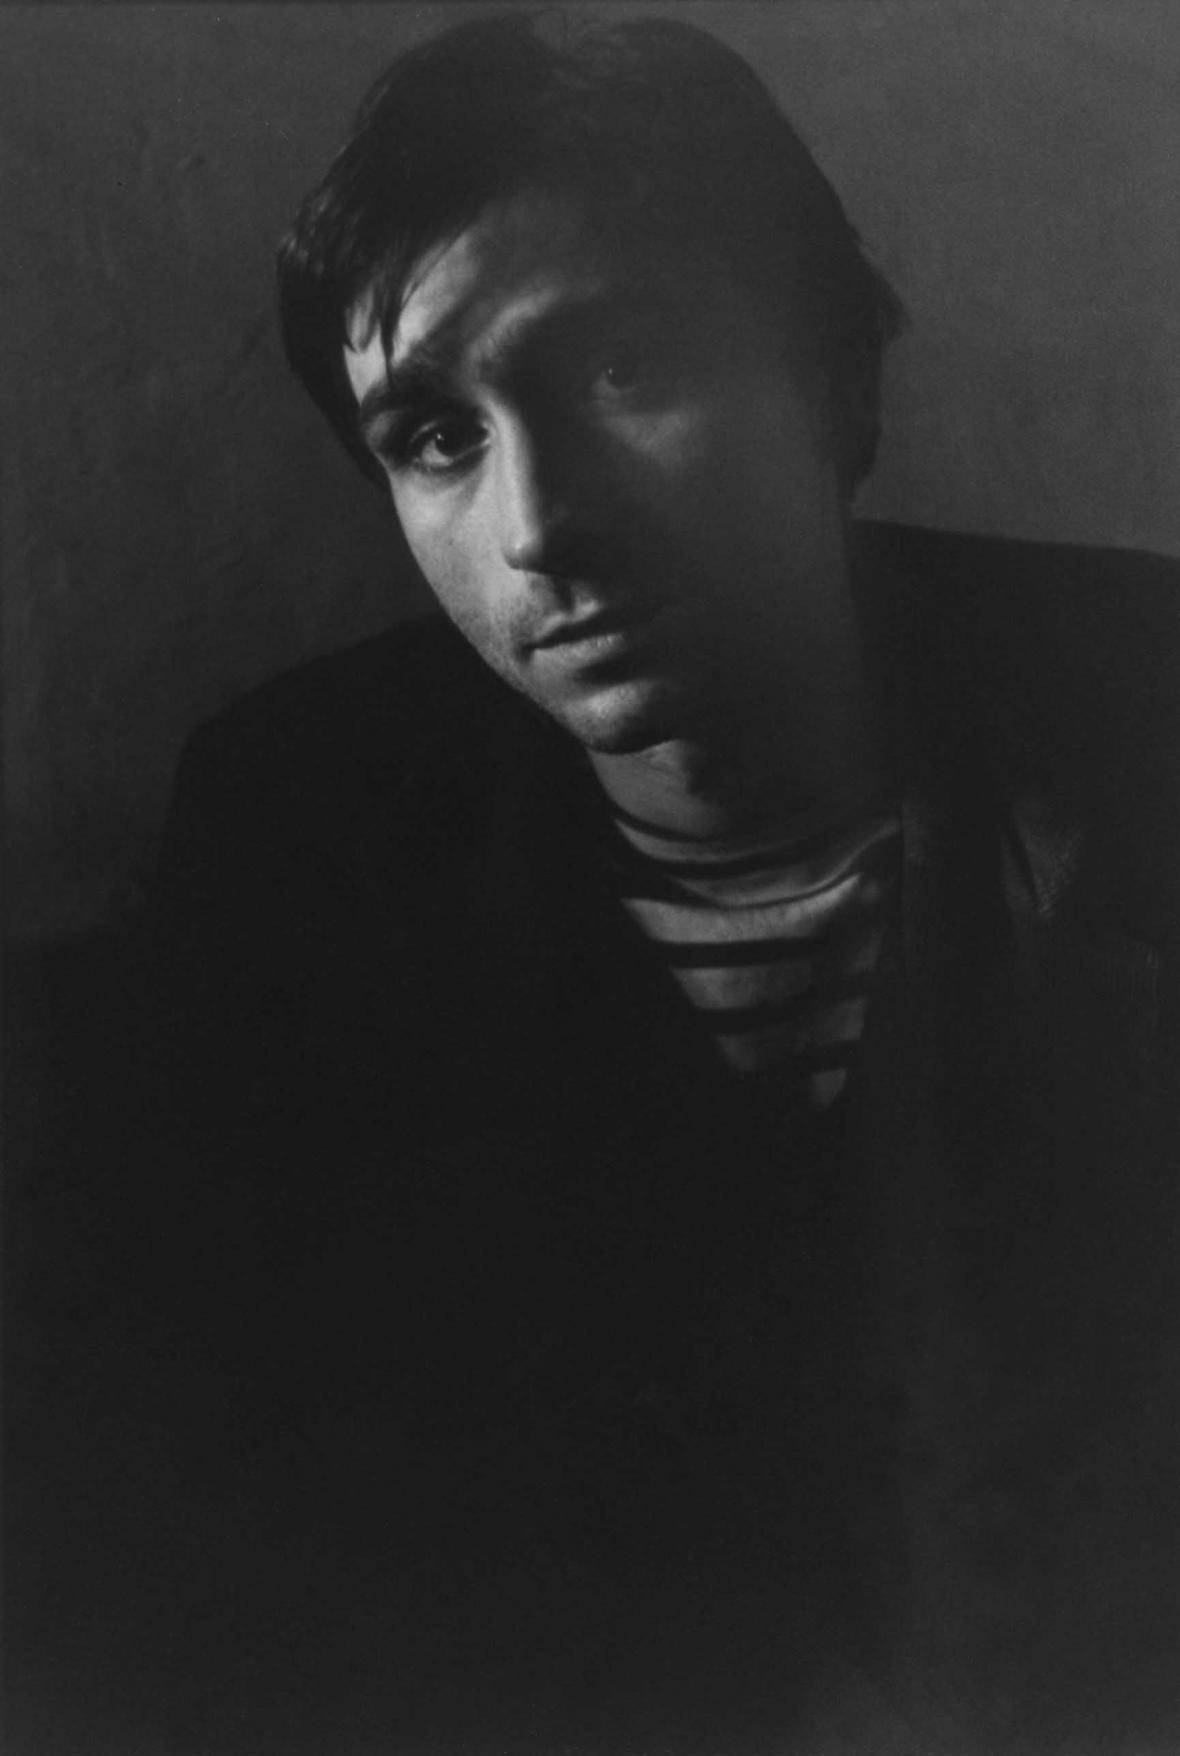 Ondra Pavelka, 1983